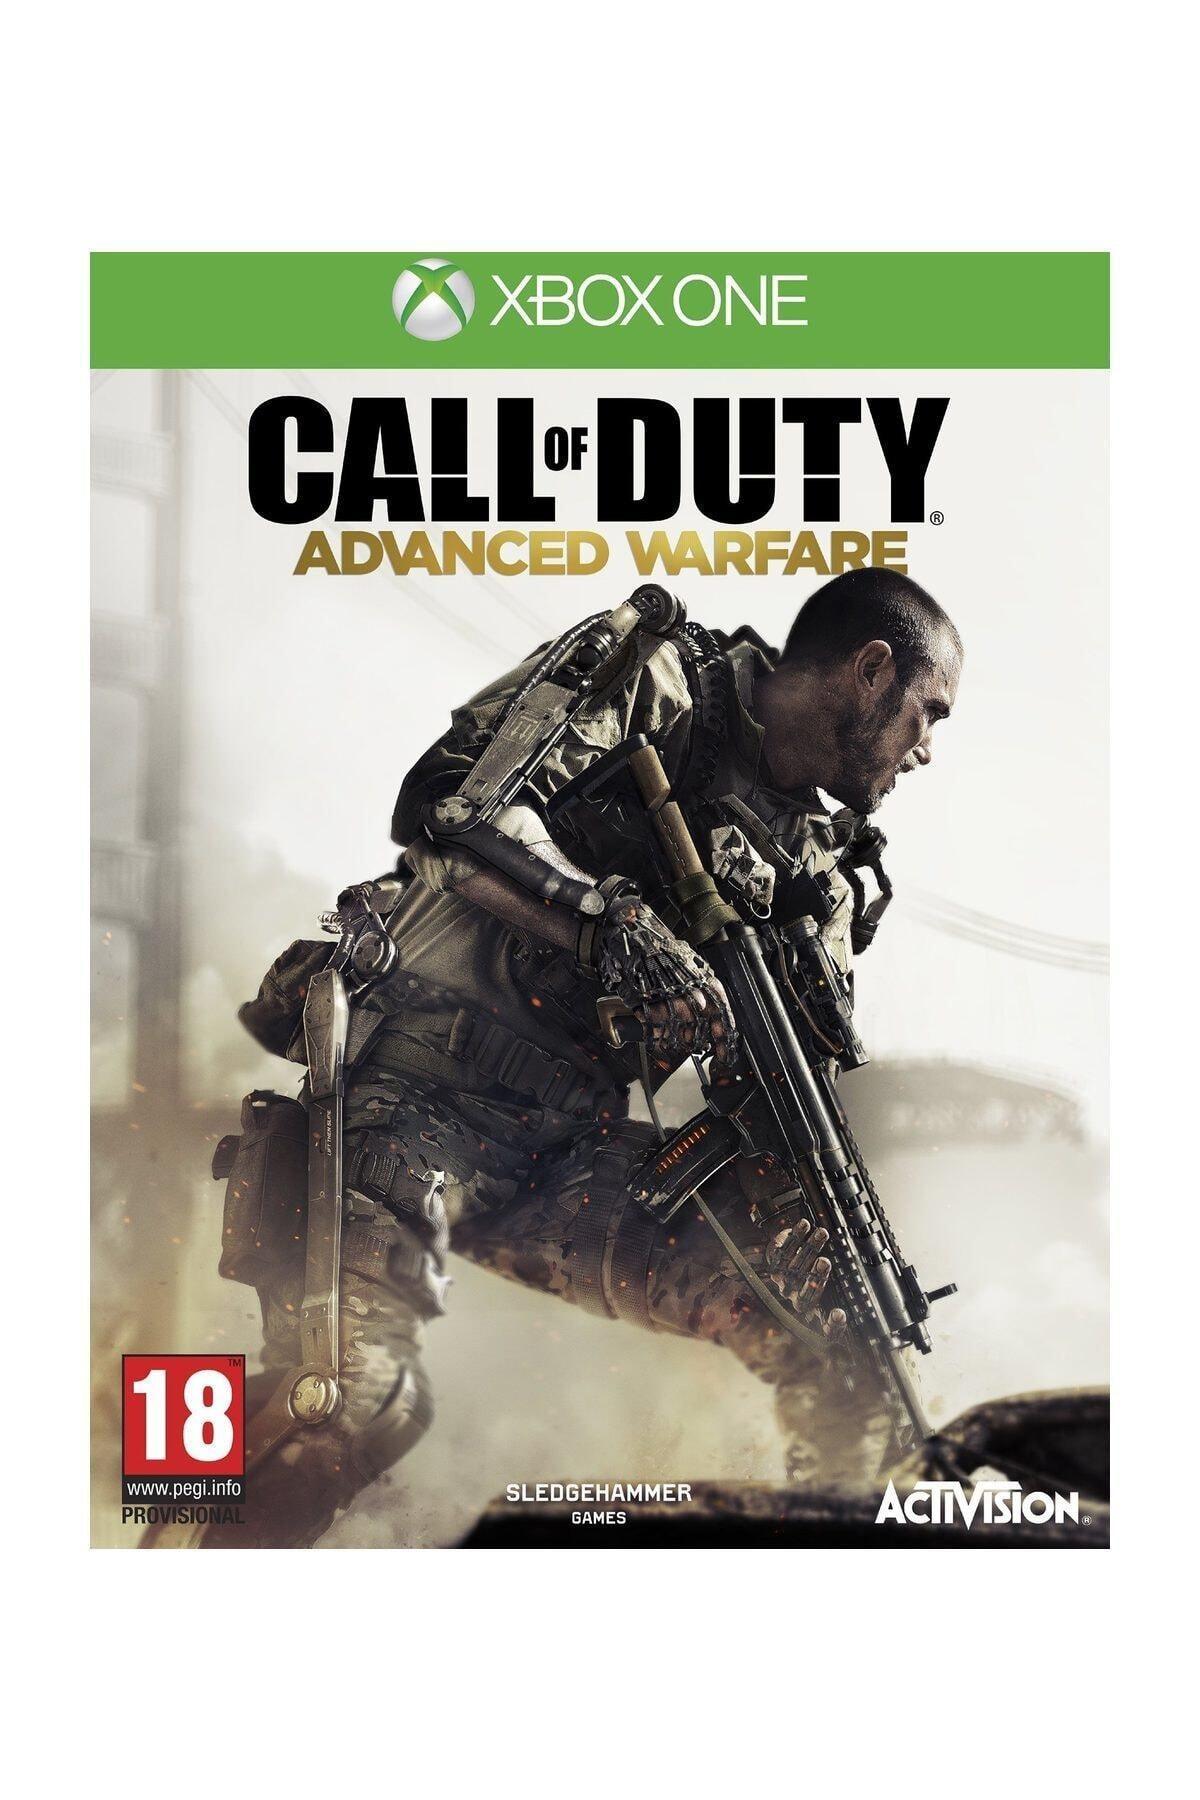 ACTIVISION Call Of Duty Advanced Warfare Xbox One Oyun 1